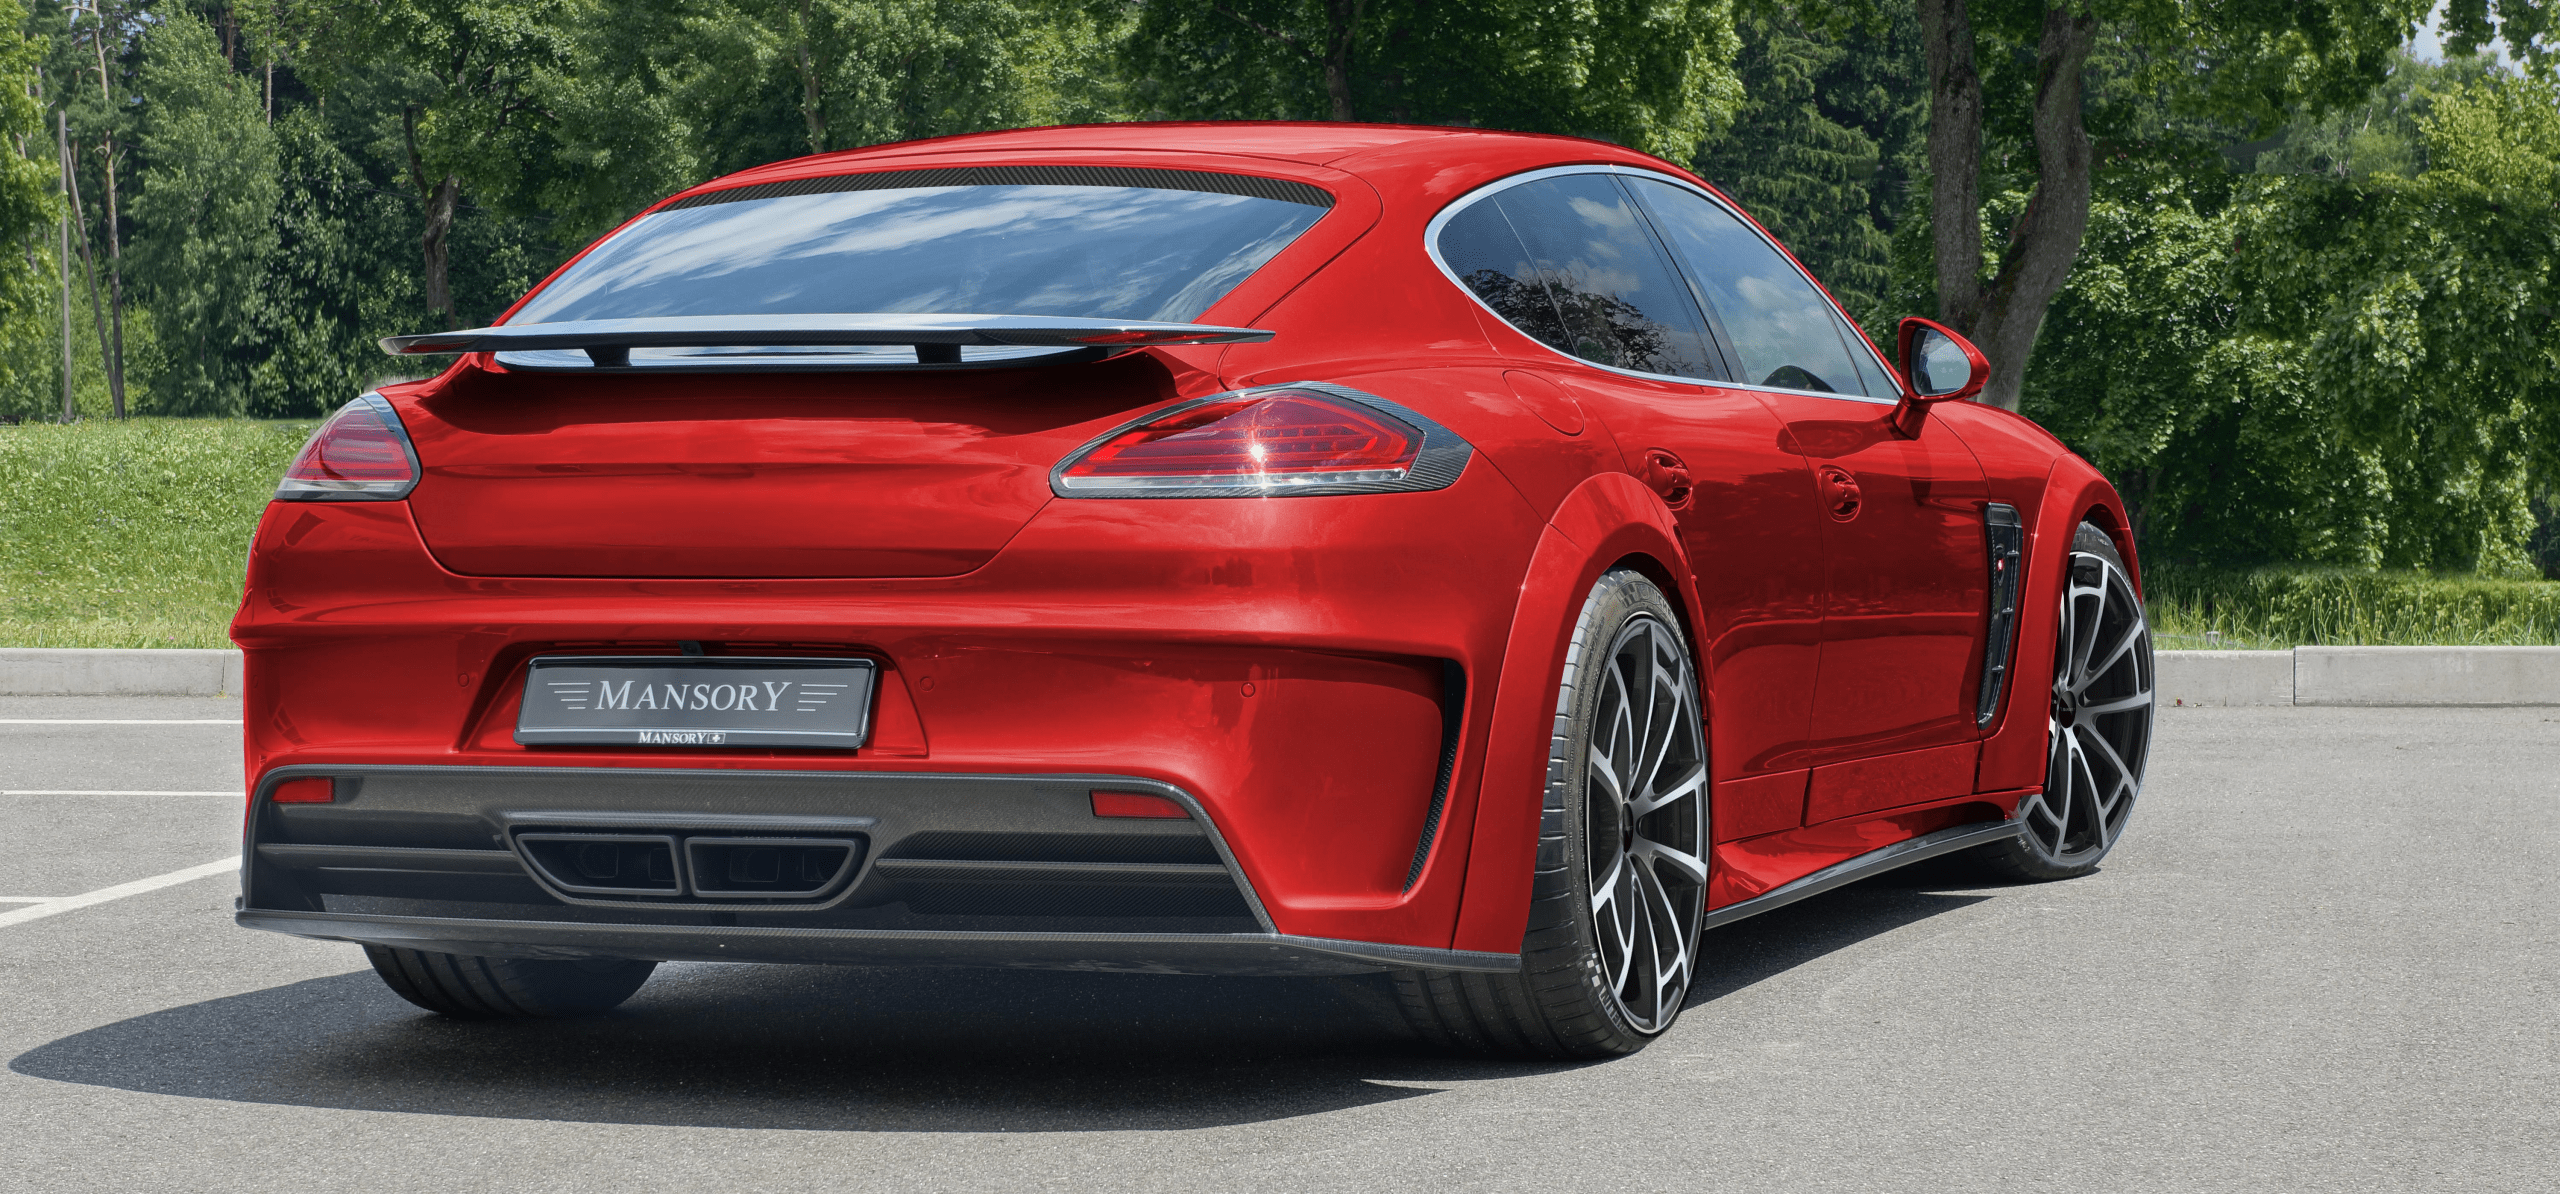 2020 Porsche Panamera Redesign Porsche Panamera Porsche Panamera Turbo S